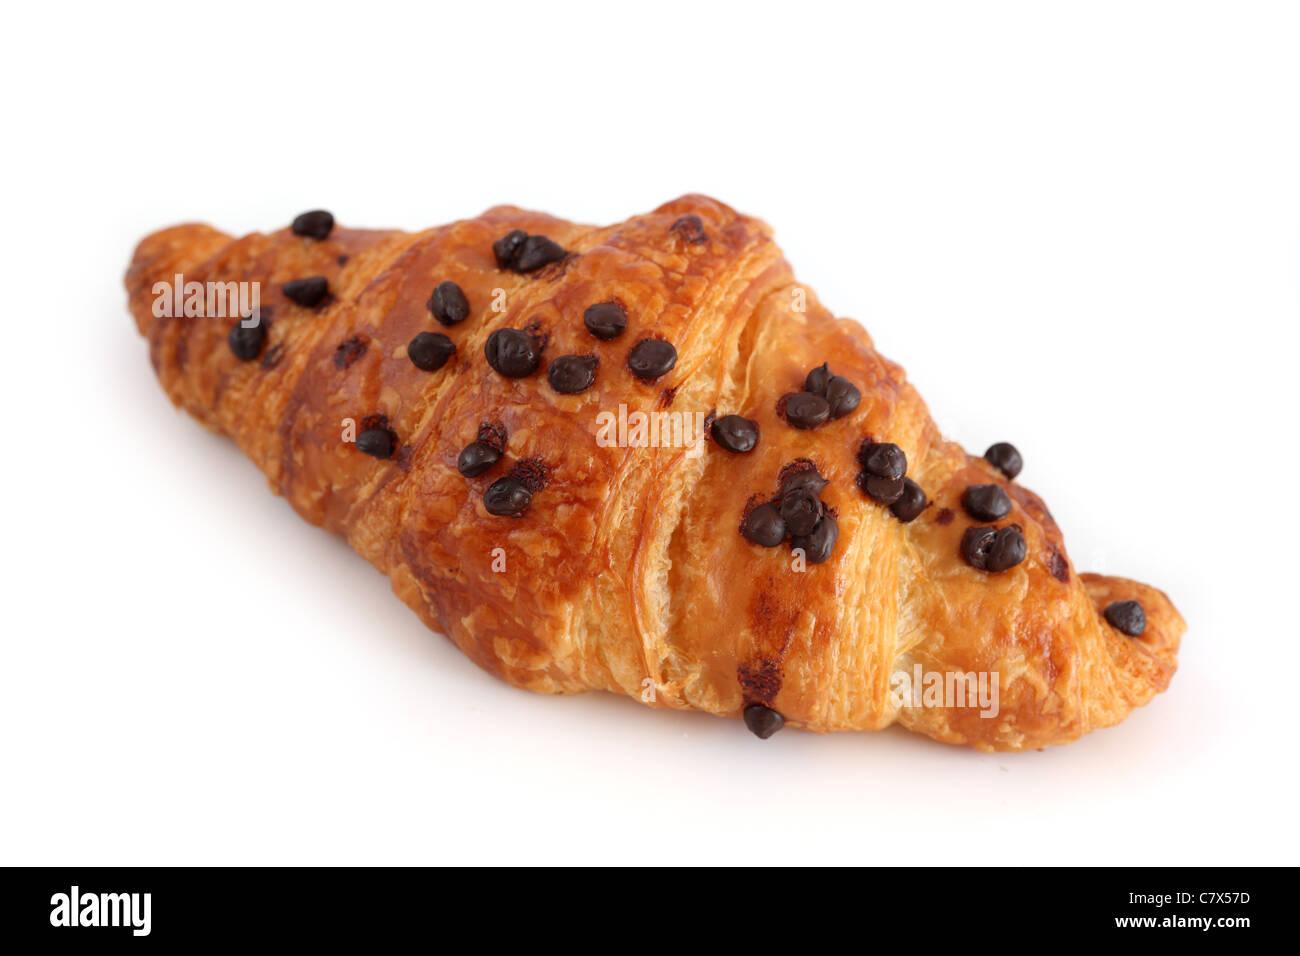 Croissant au chocolat Chocolate Croissant - Stock Image